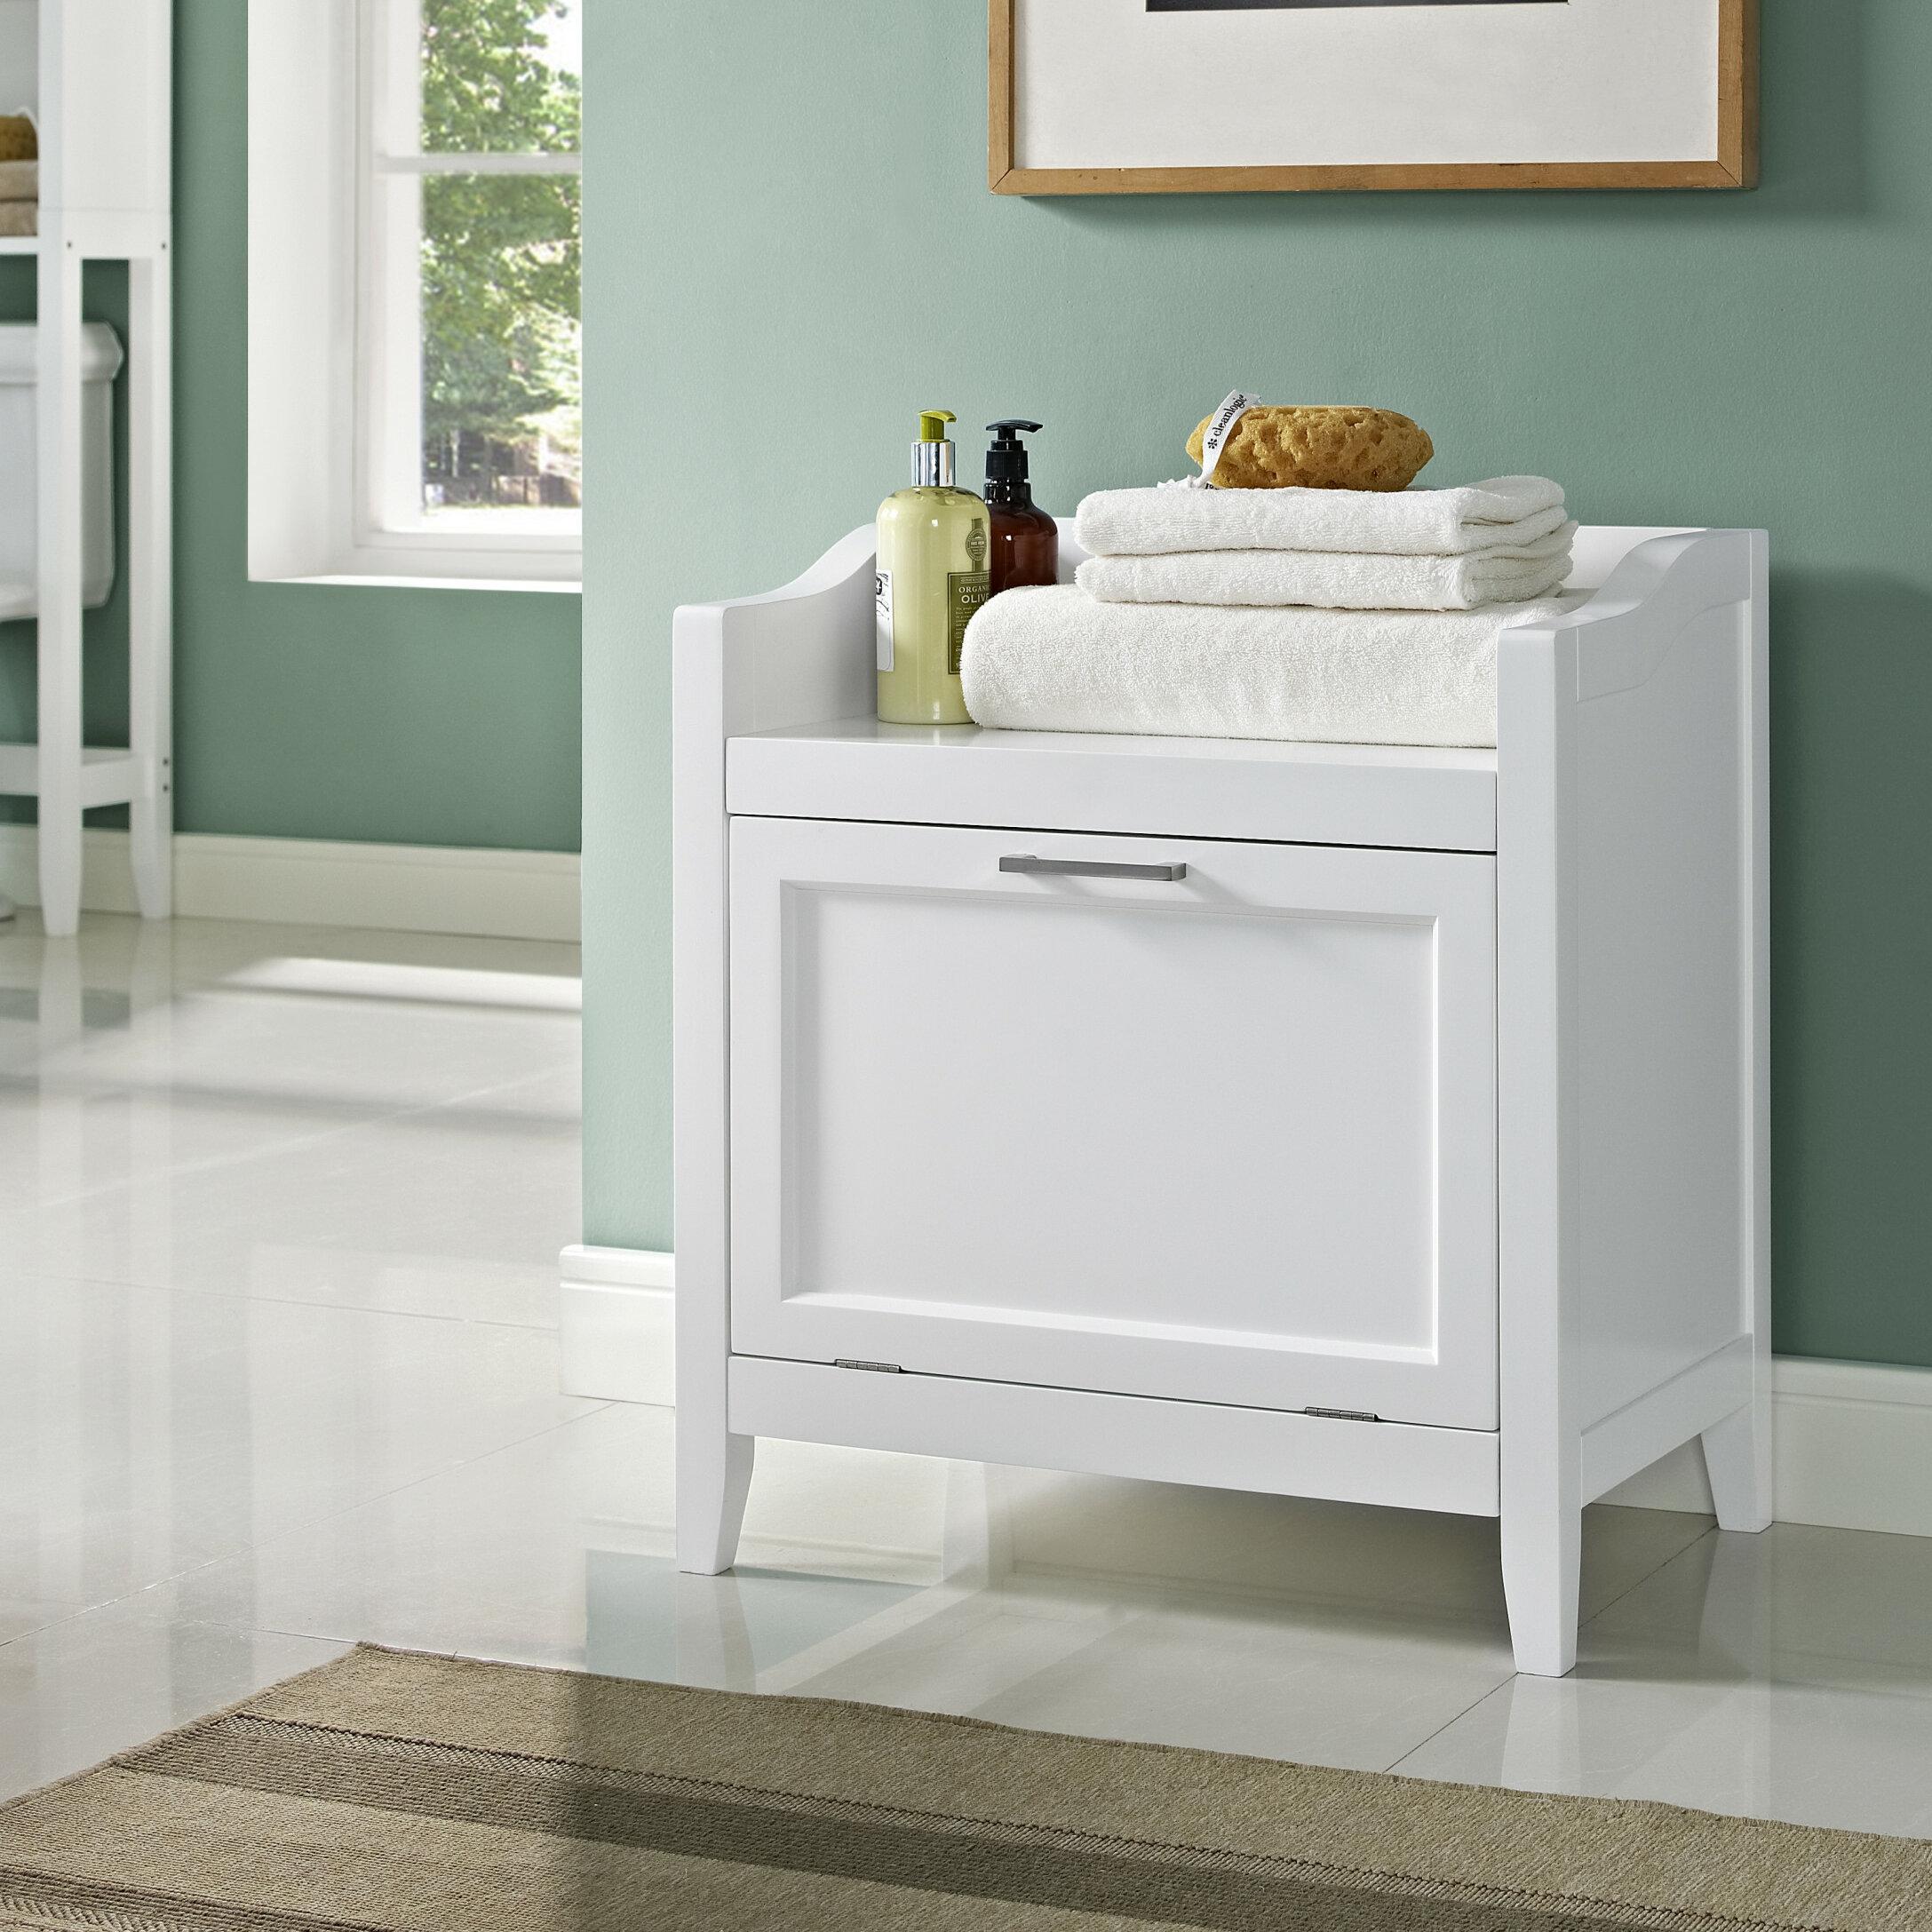 Simpli Home Avington Storage Cabinet Laundry Hamper & Reviews | Wayfair